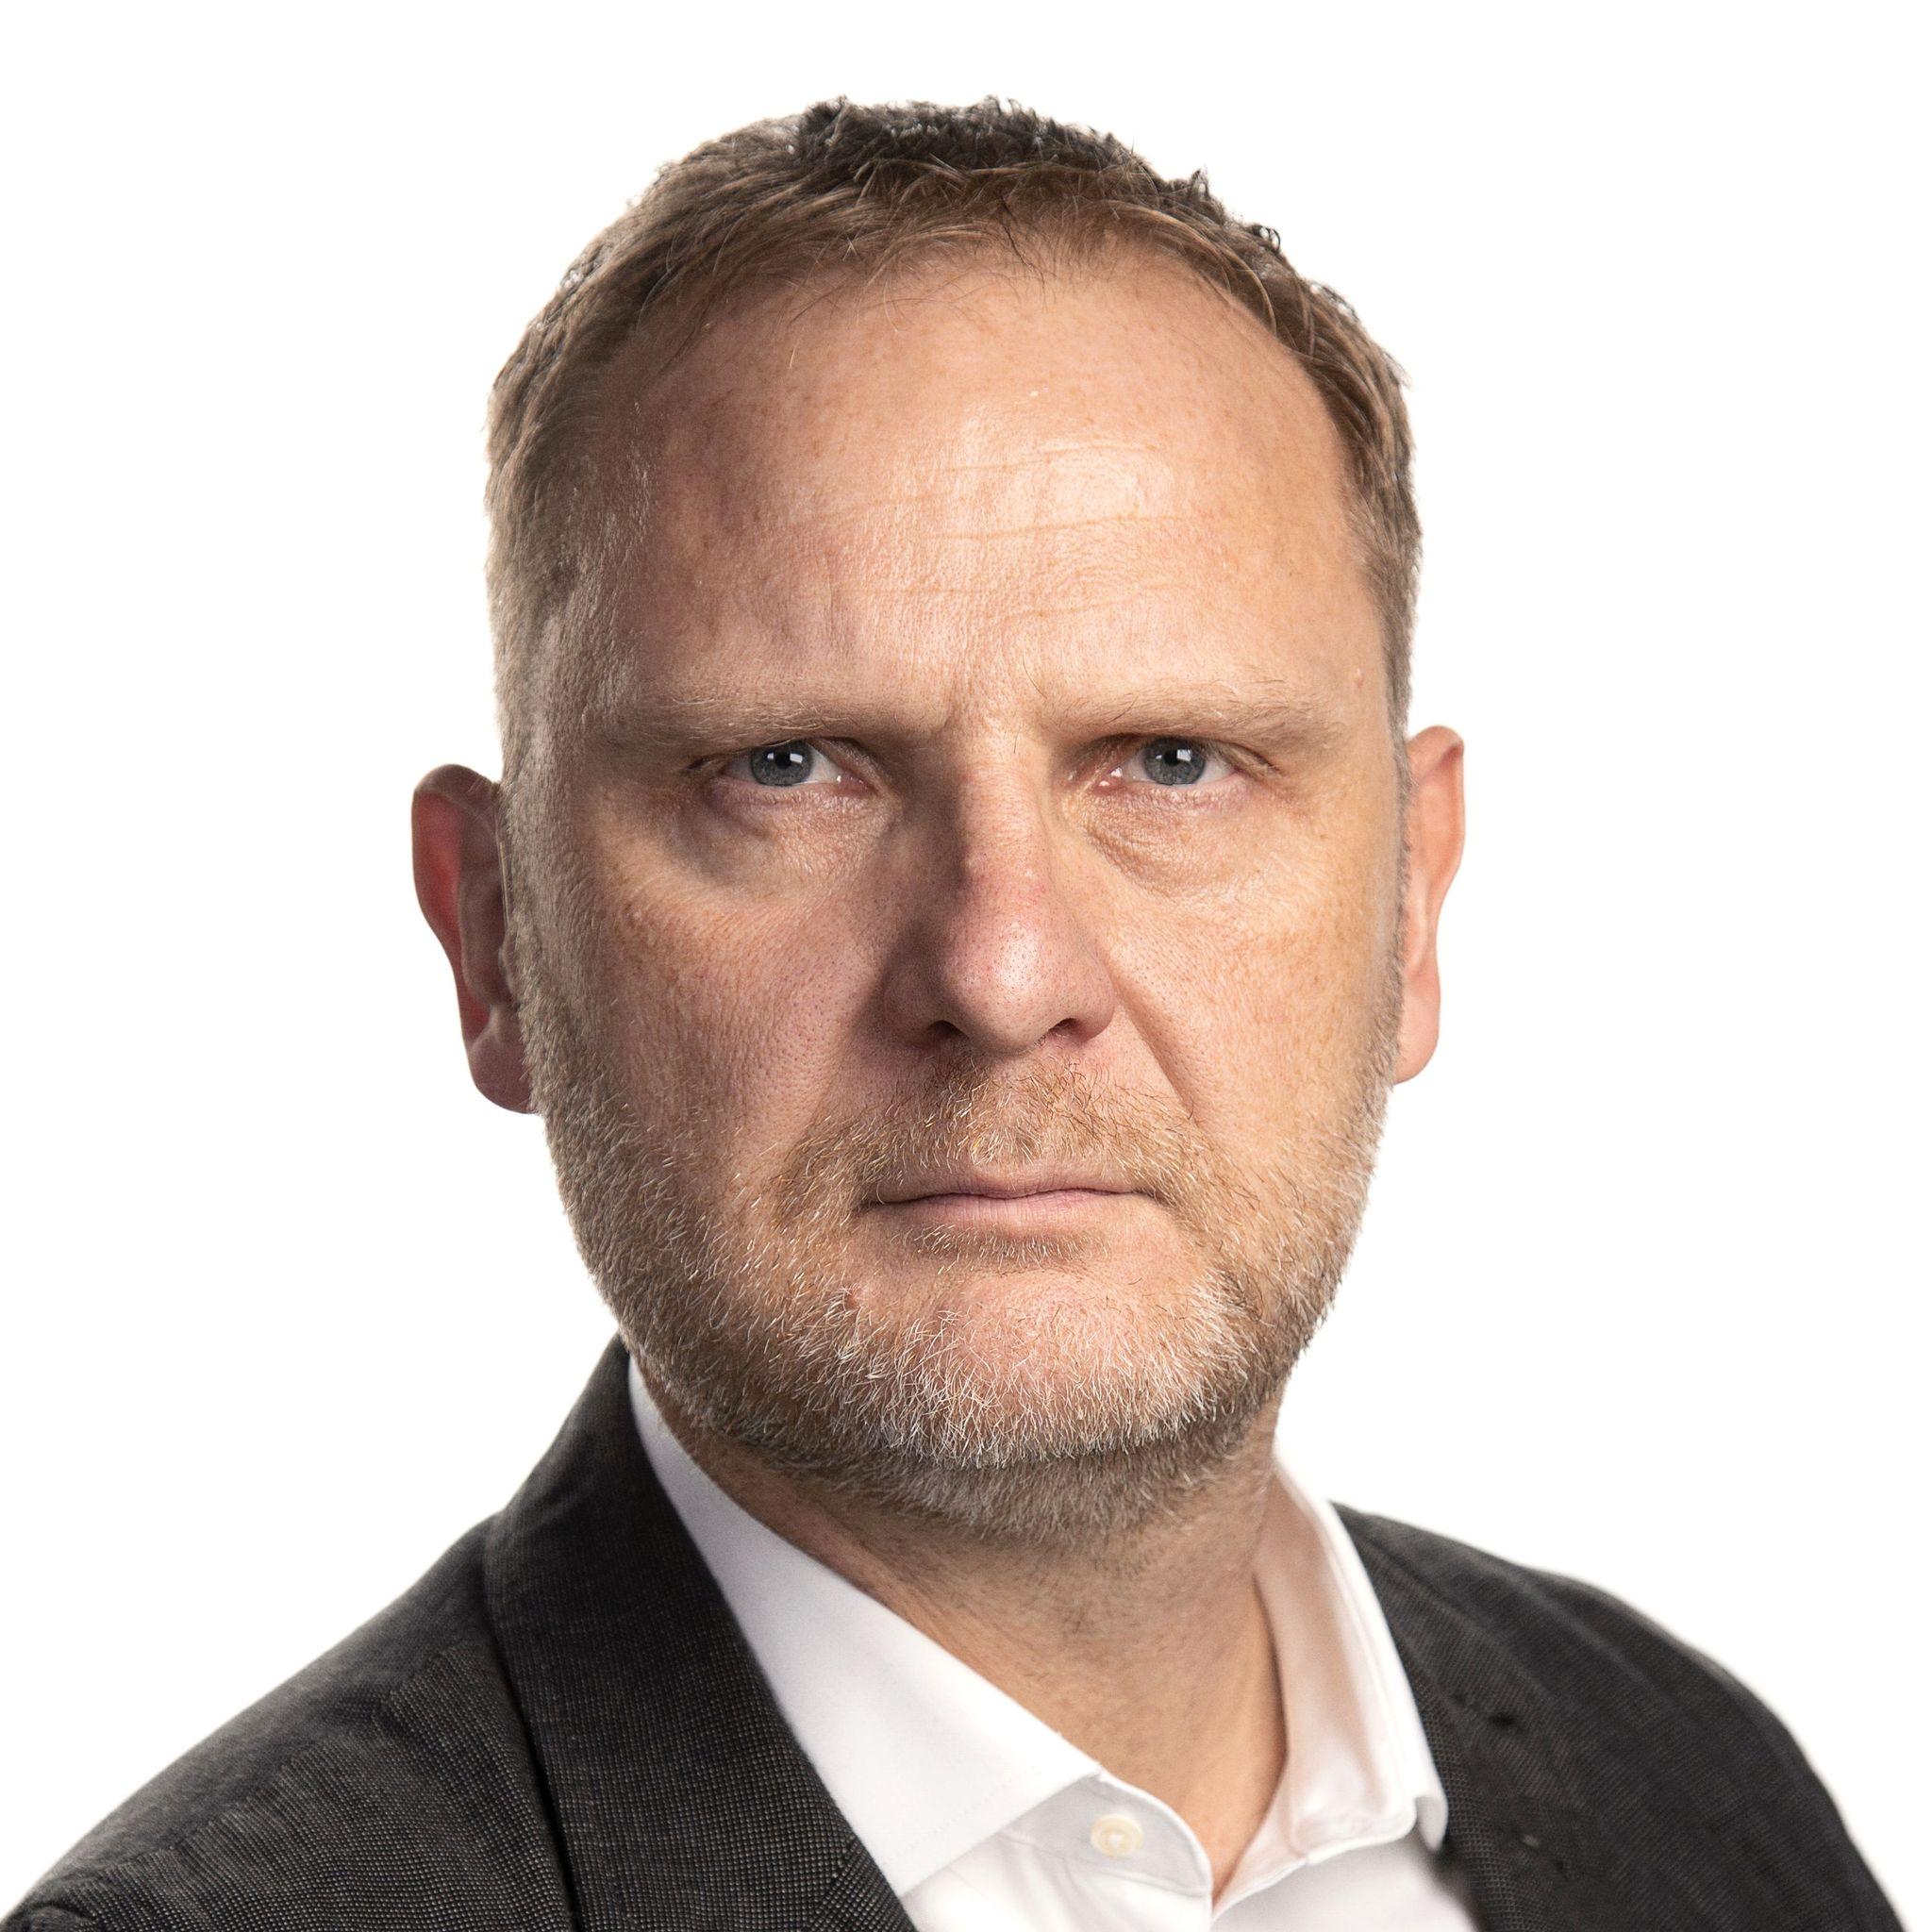 Frank Rossavik